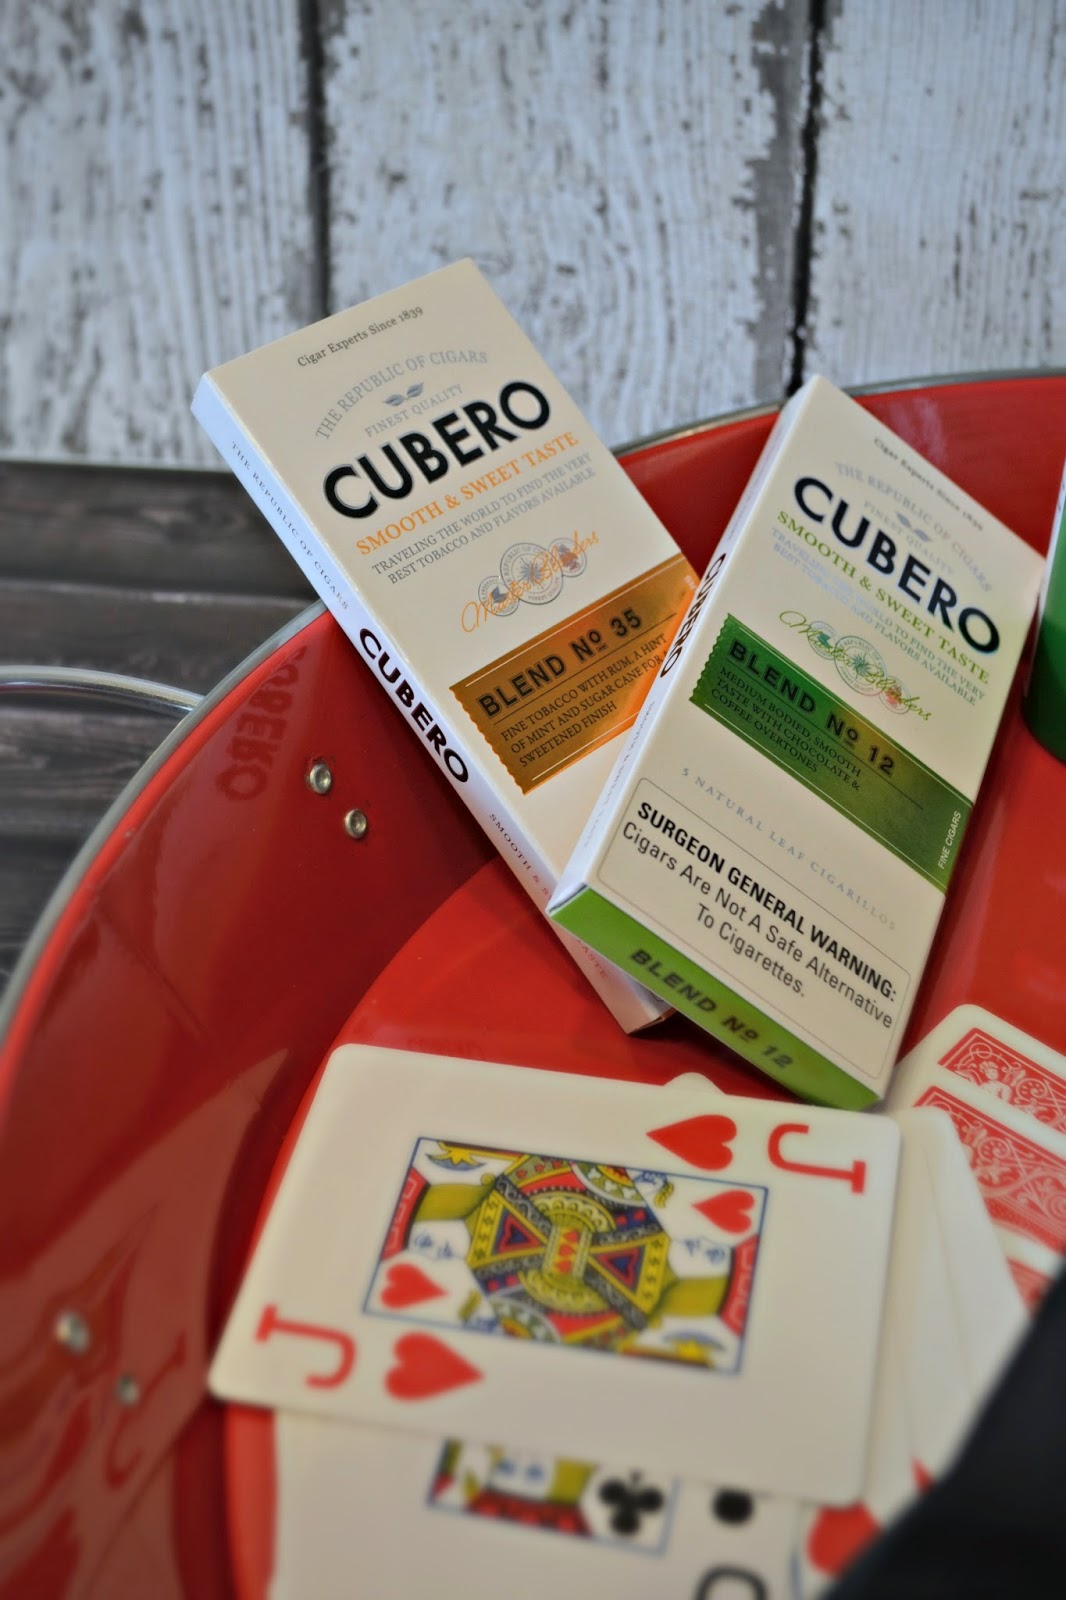 Cubero Cigars - Guys Night In